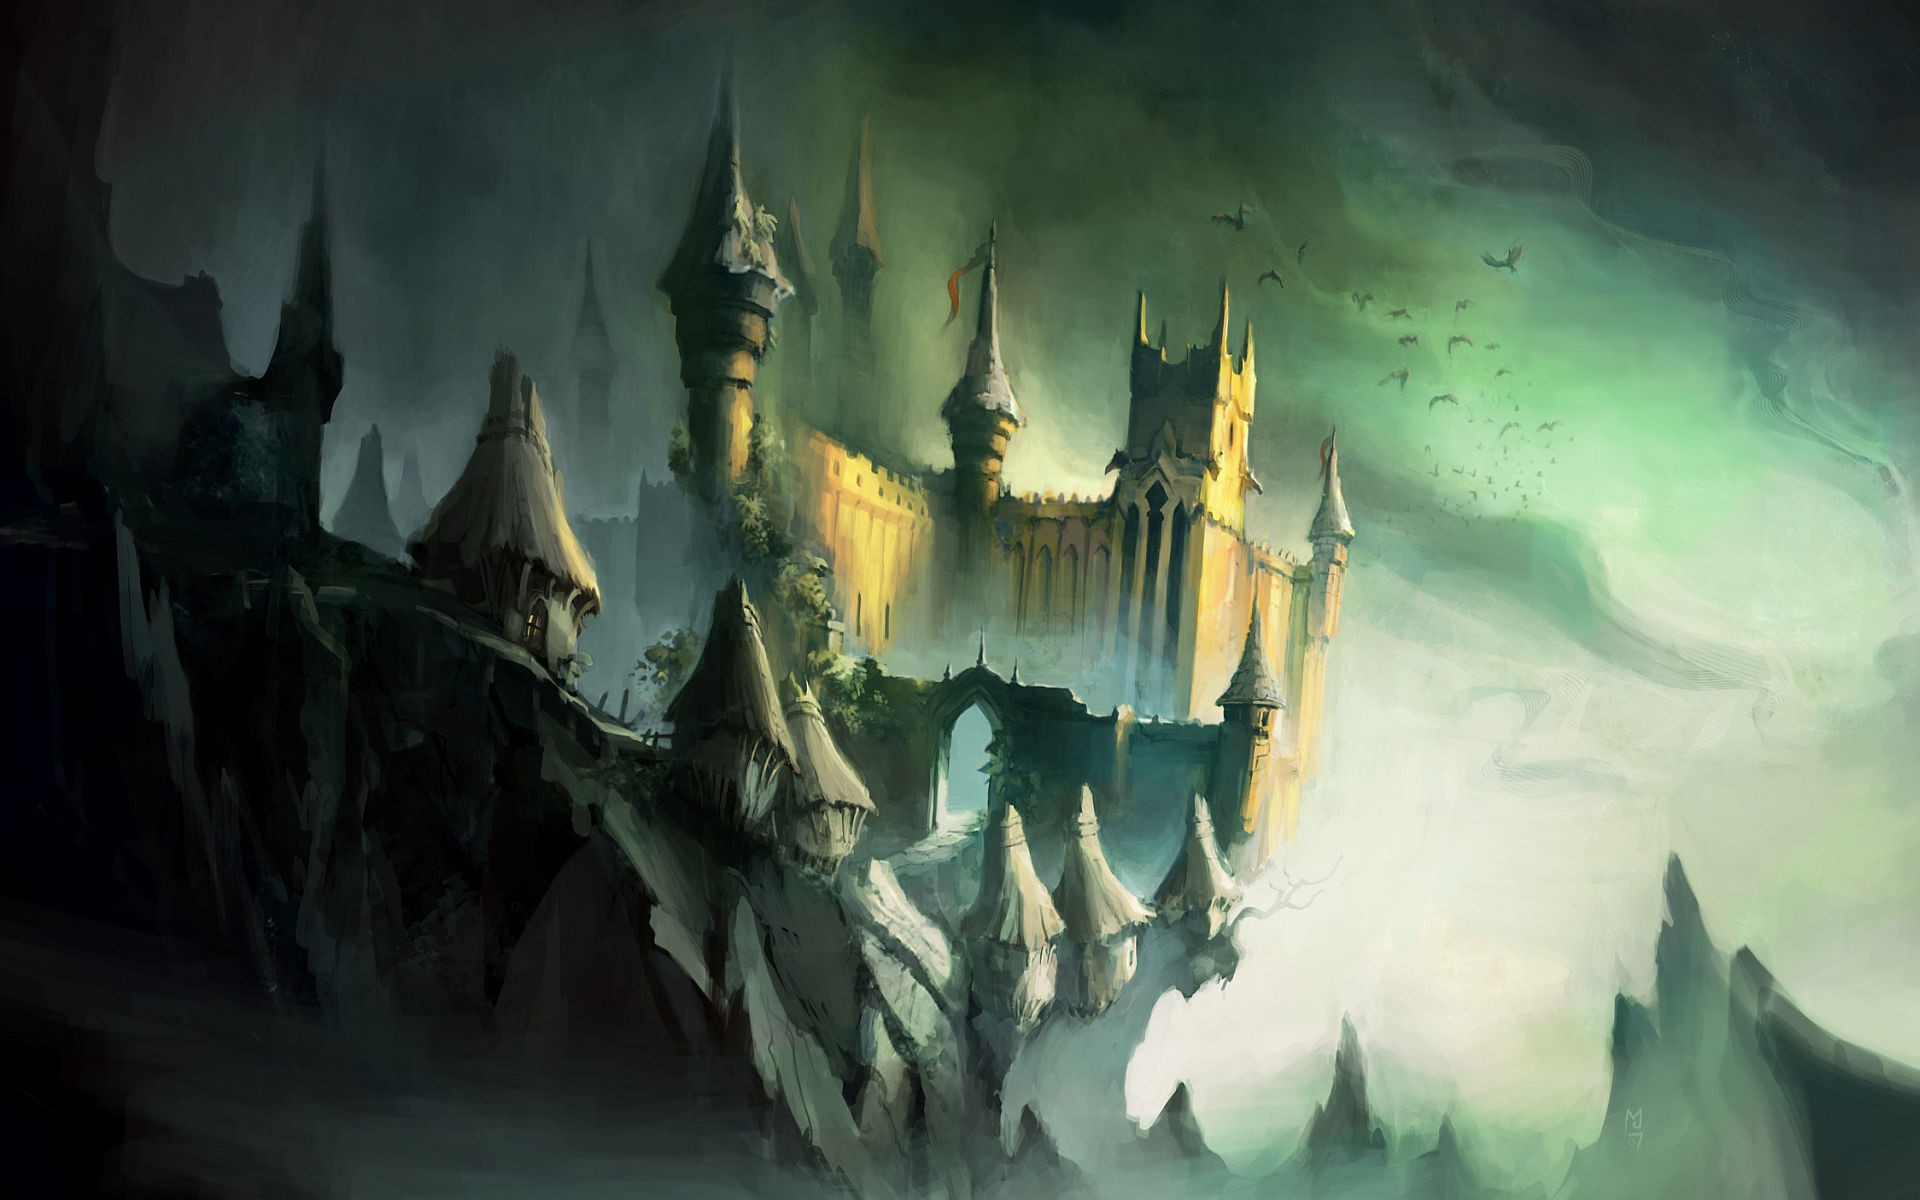 General 1920x1200 castle fantasy art artwork